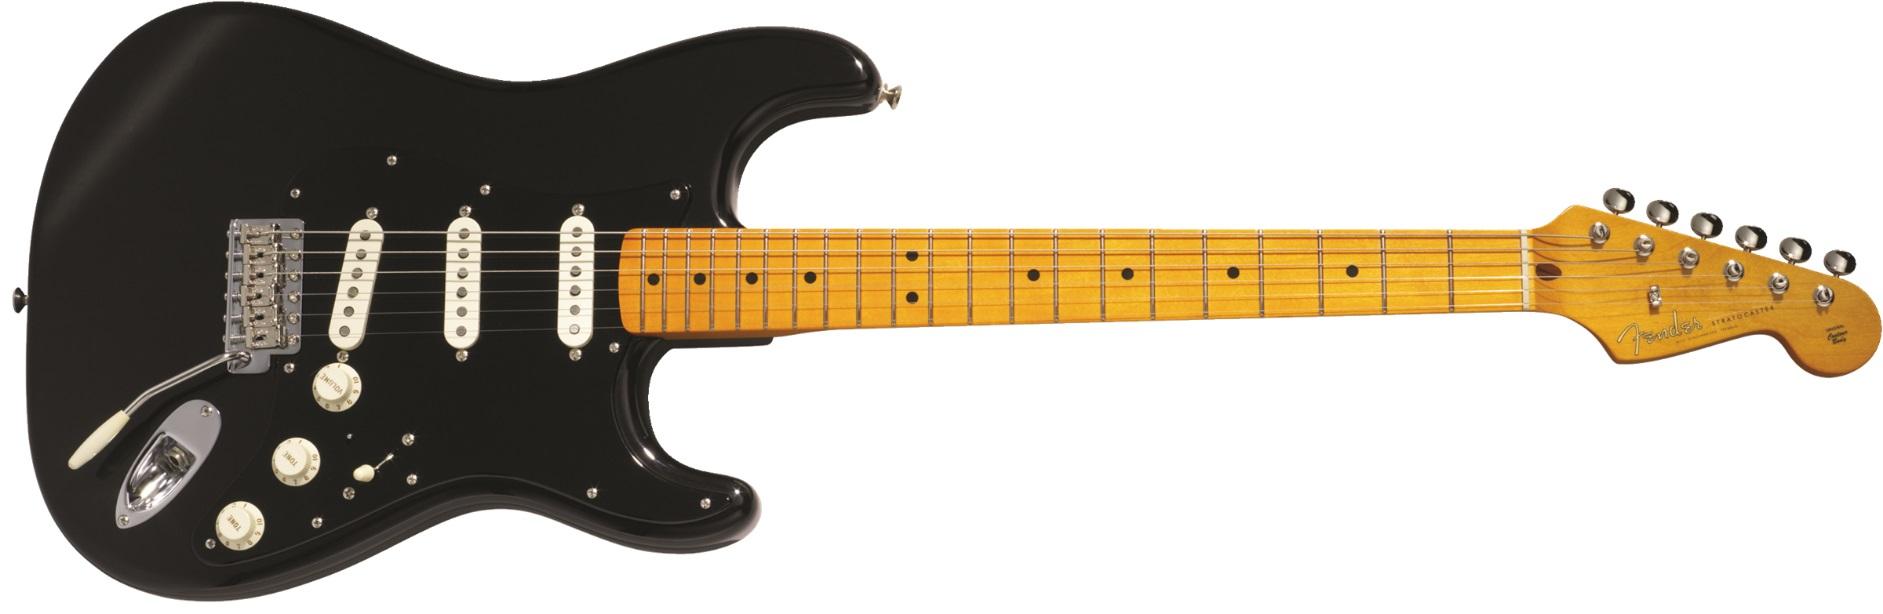 Fender David Gilmour Signature Stratocaster NOS MN BK